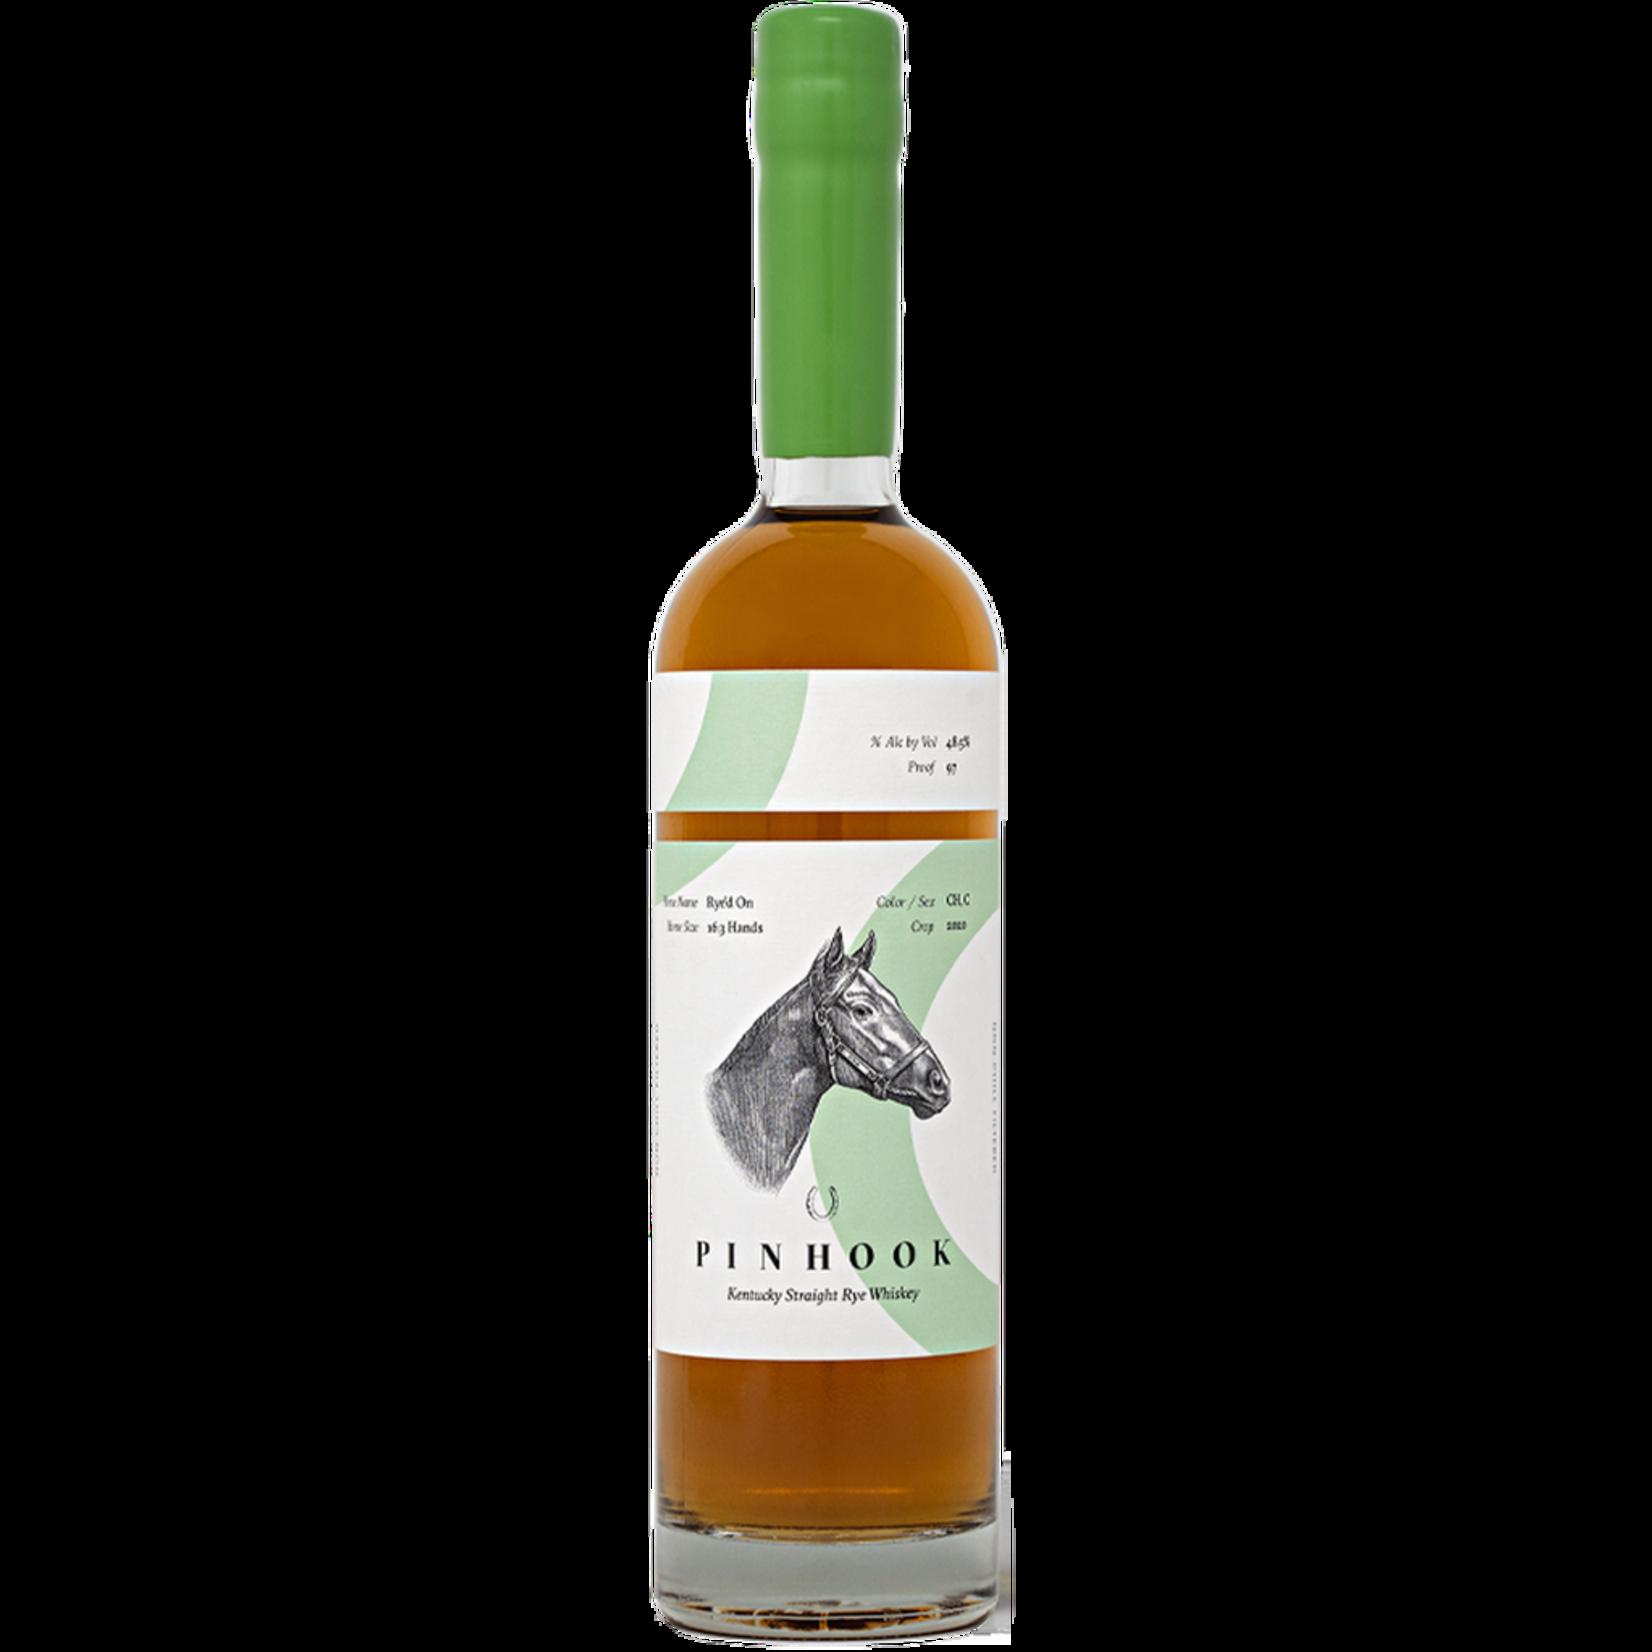 Spirits Pinhook Rye'd On Kentucky Straight Rye Whiskey Perfect Proof 97°